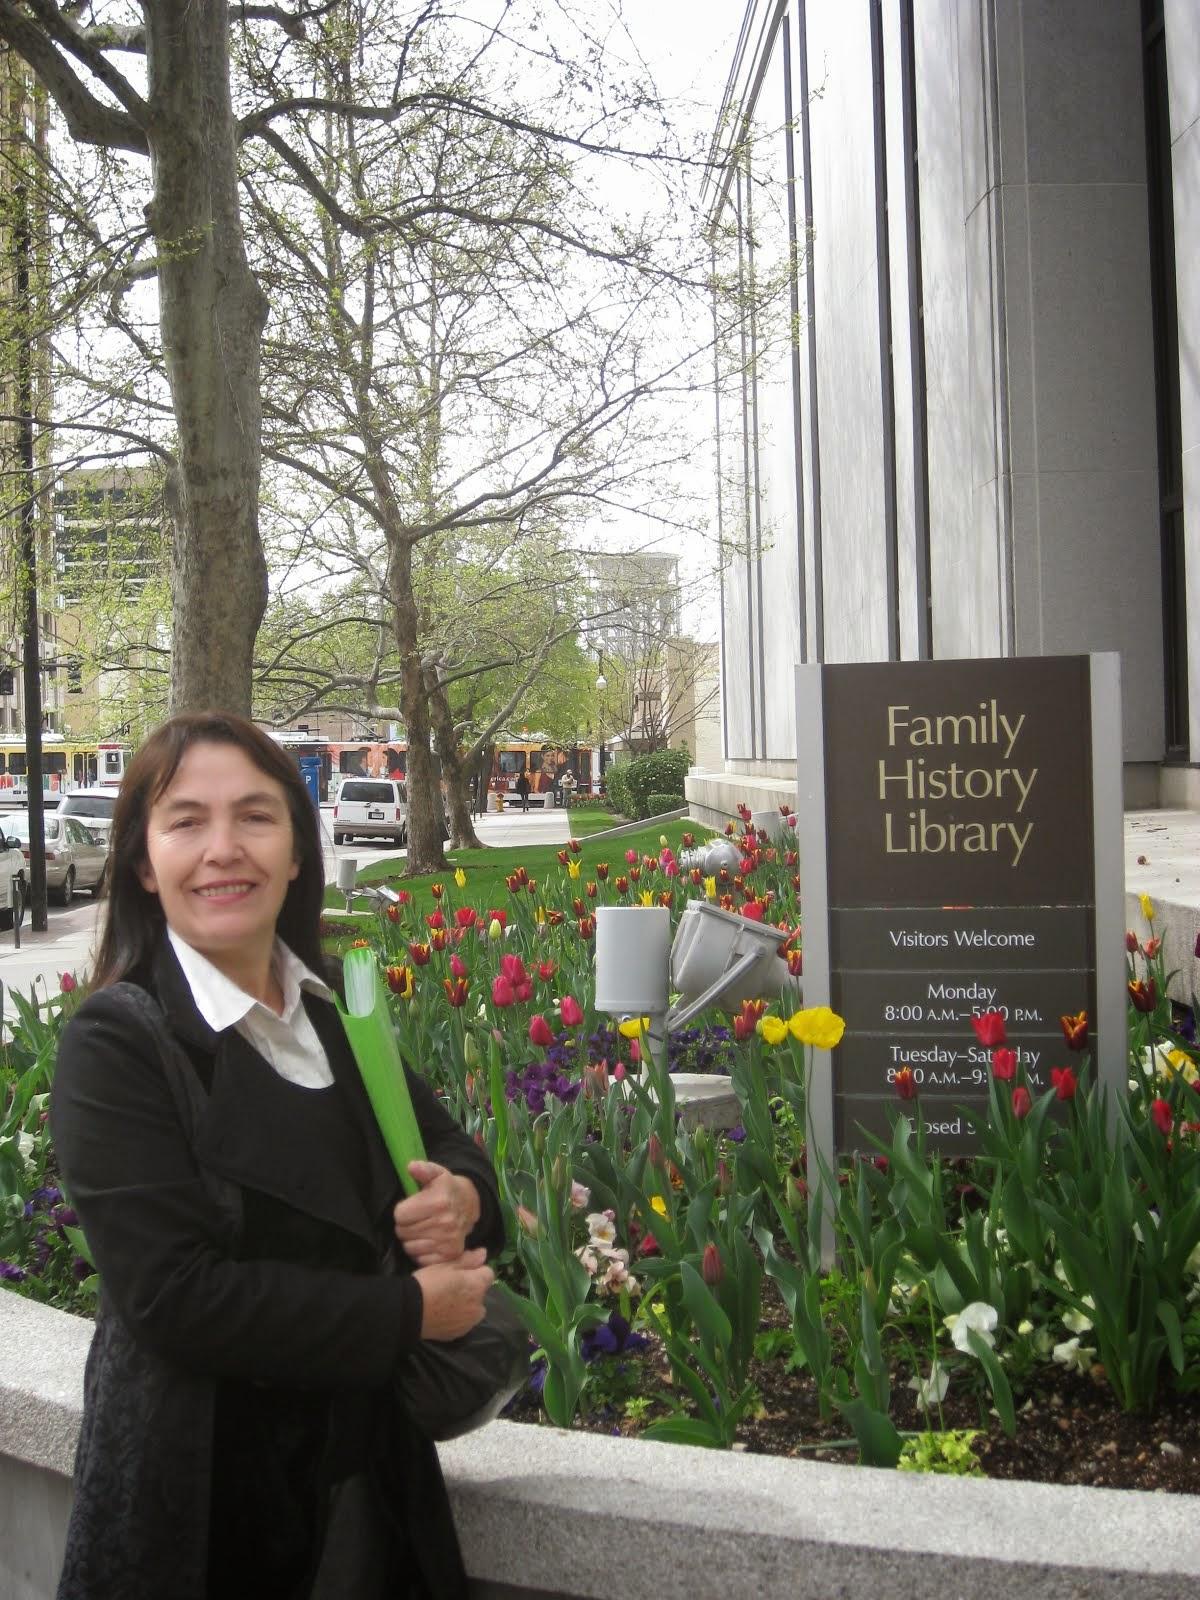 Visita a la Family History Library,  año 2012